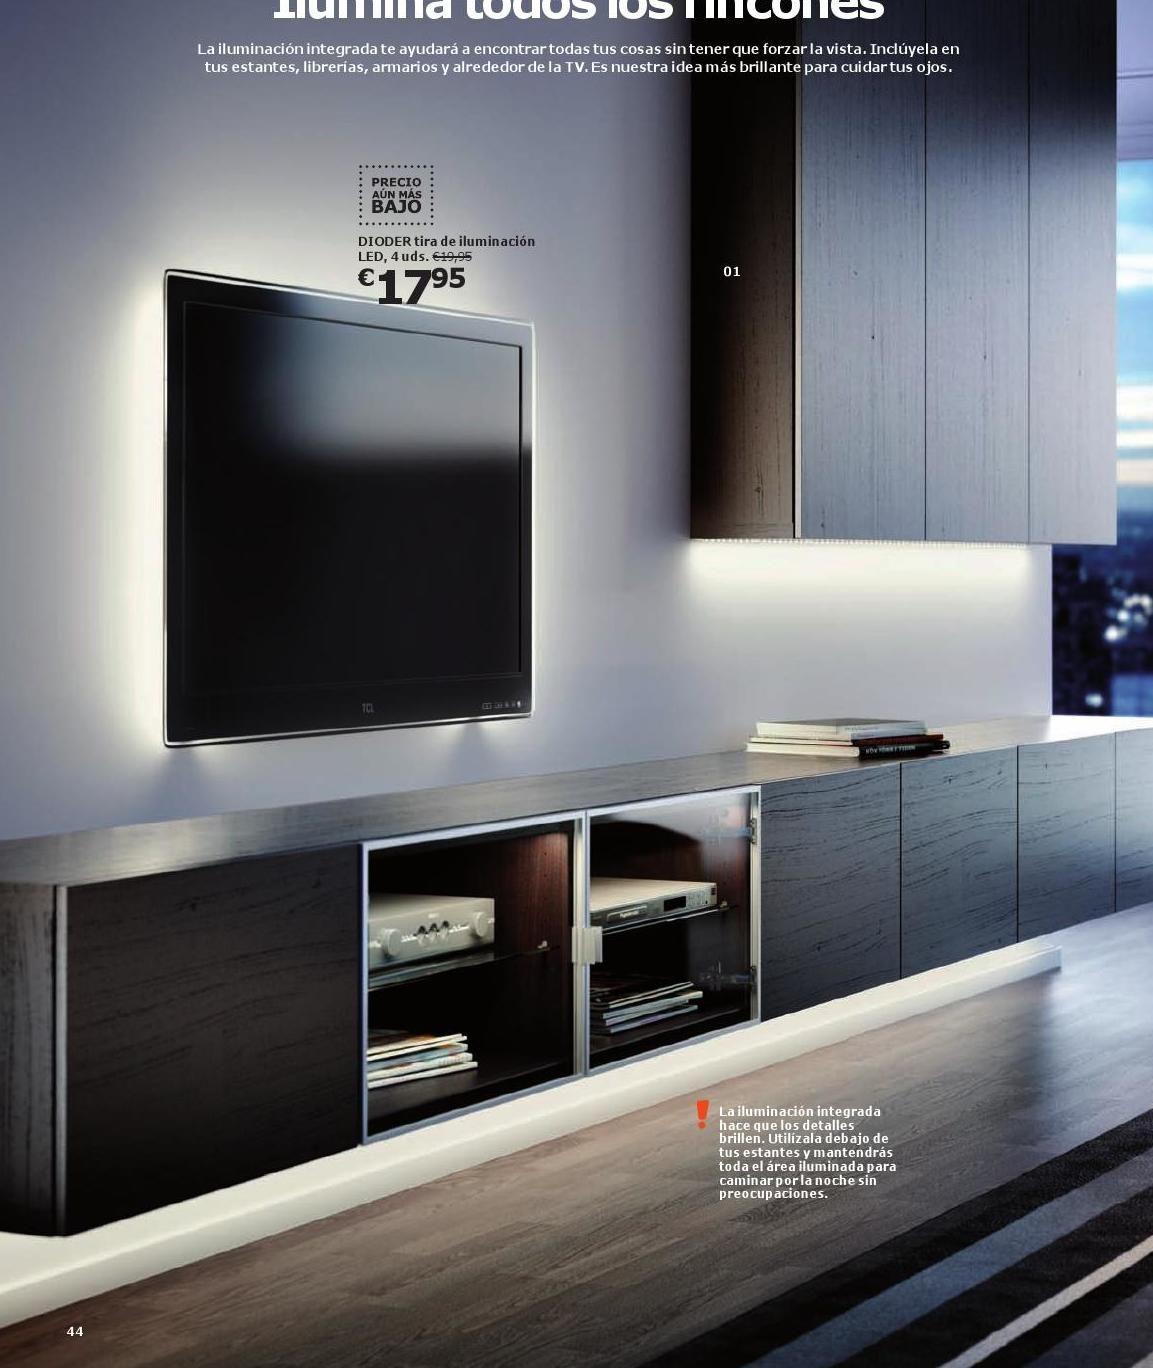 Catalogo ikea salon 2014 canarias | muebles en 2019 ...